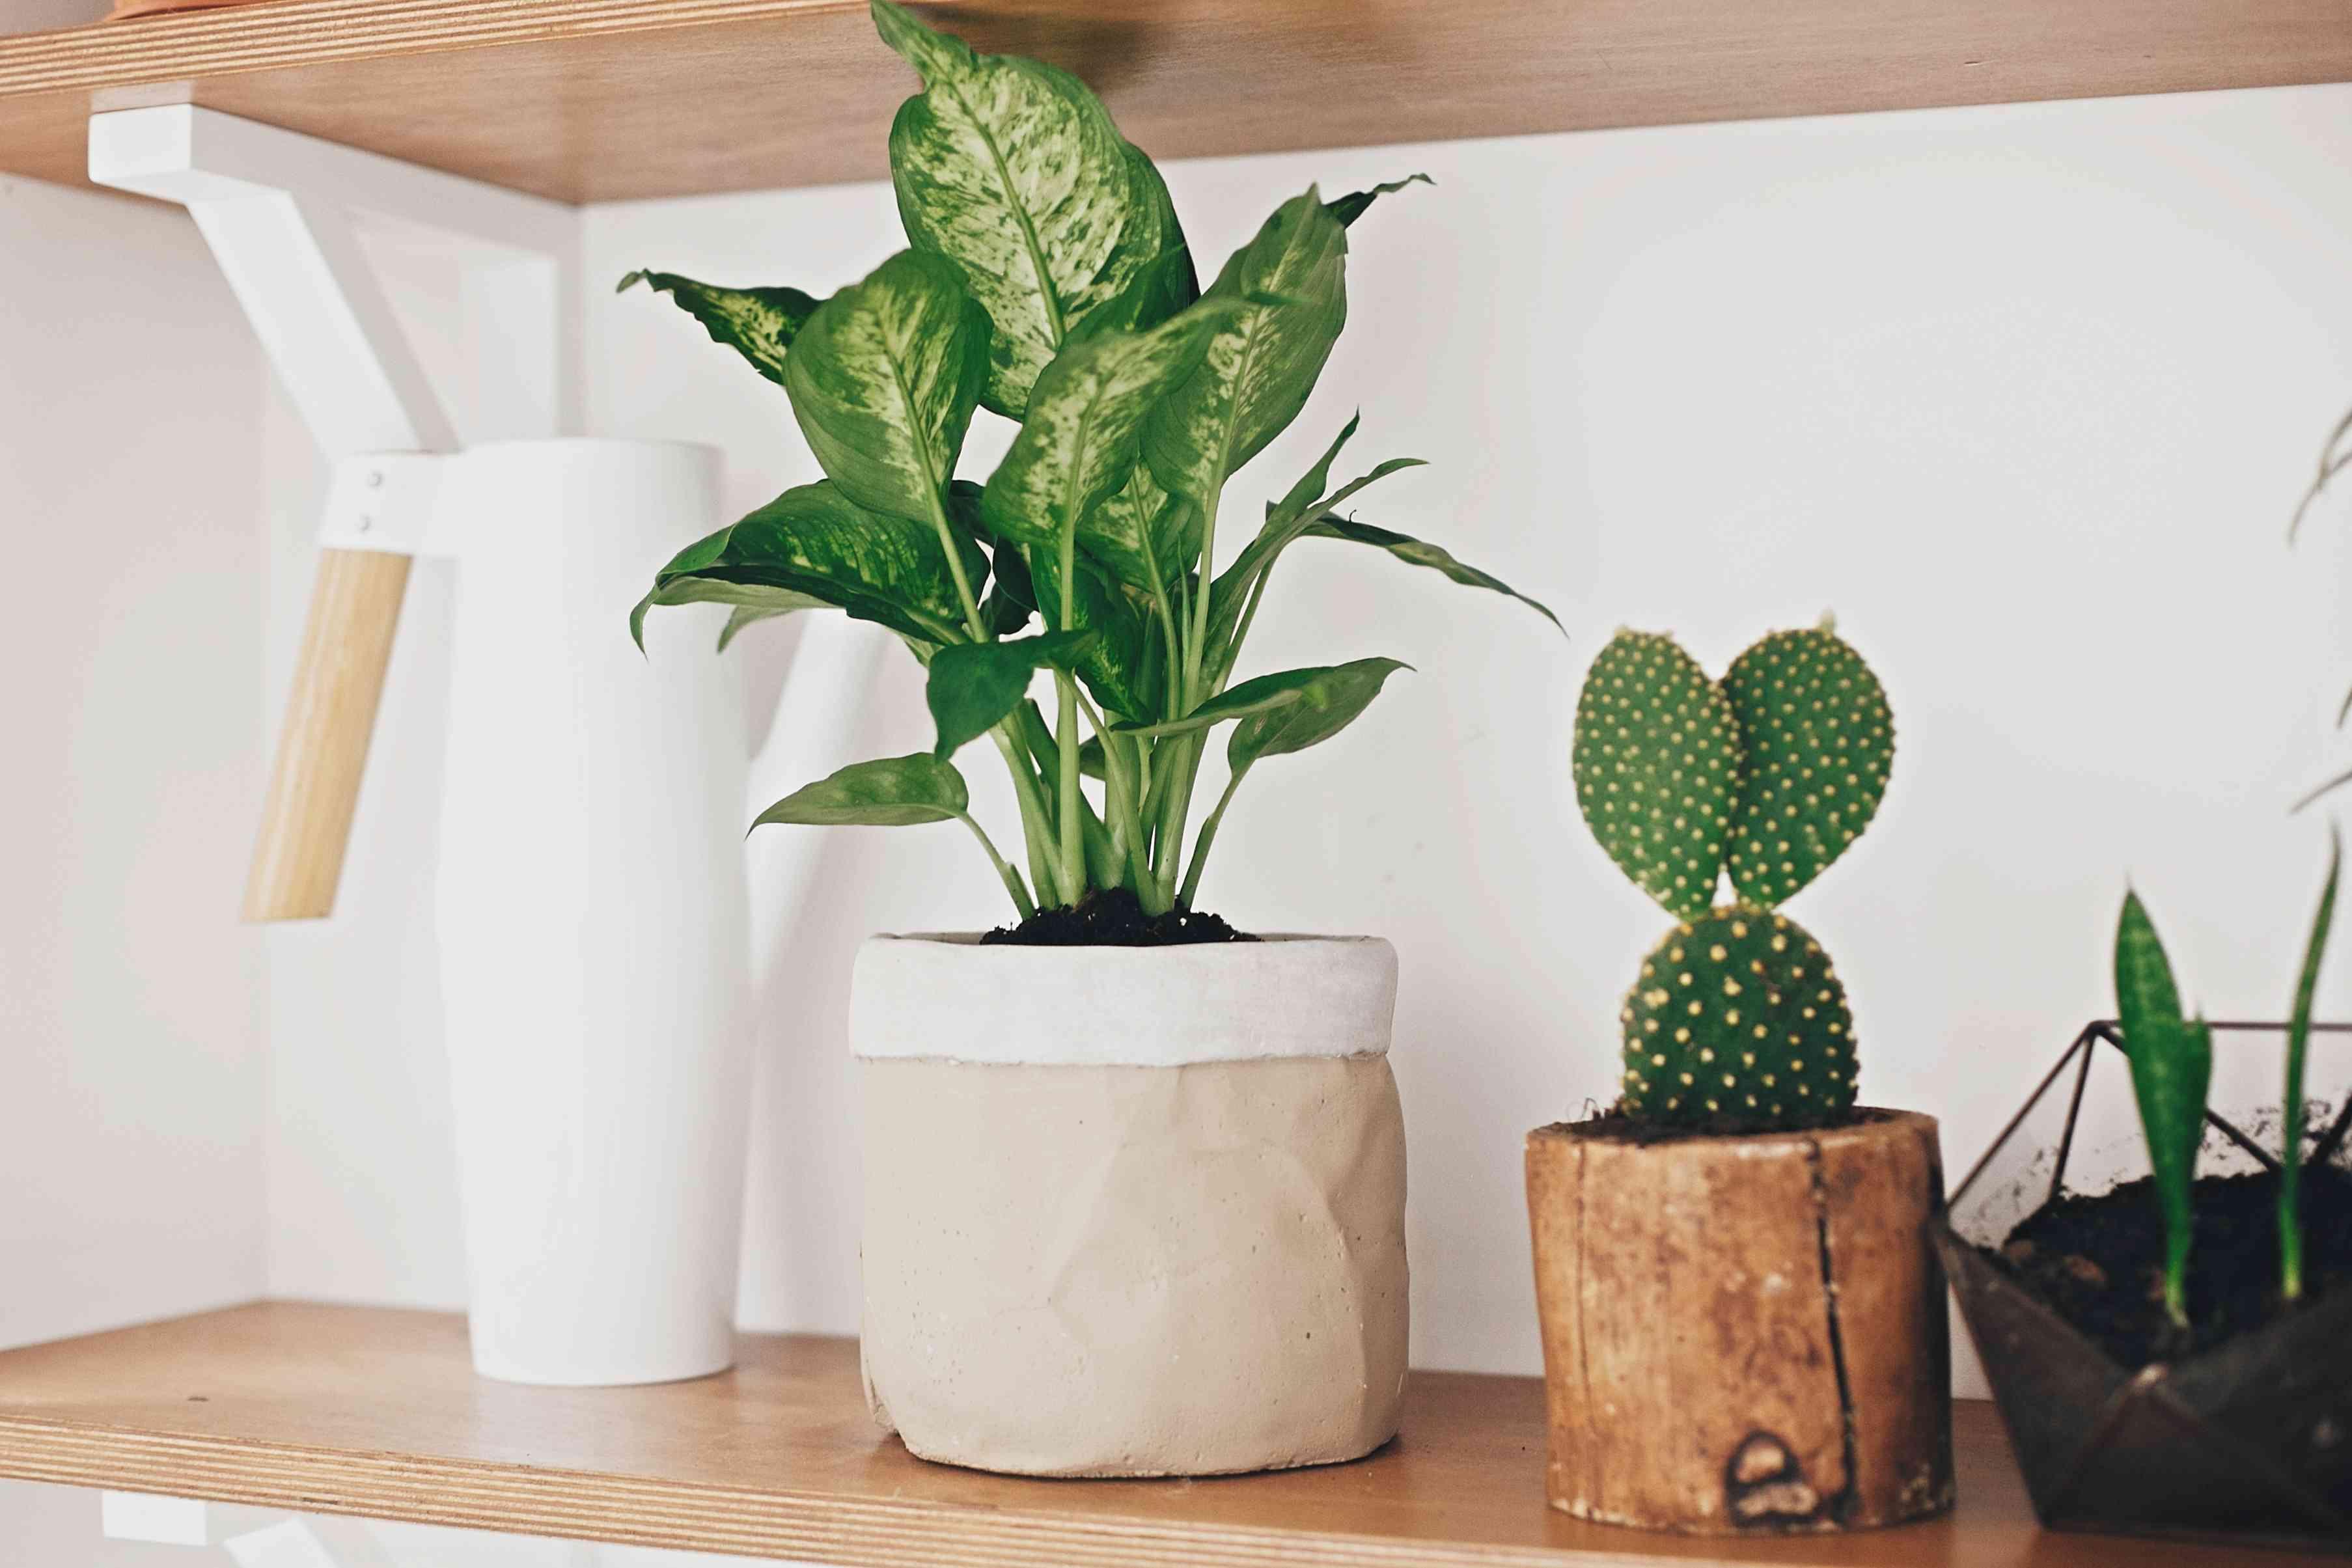 houseplants in wooden shelf against white wall